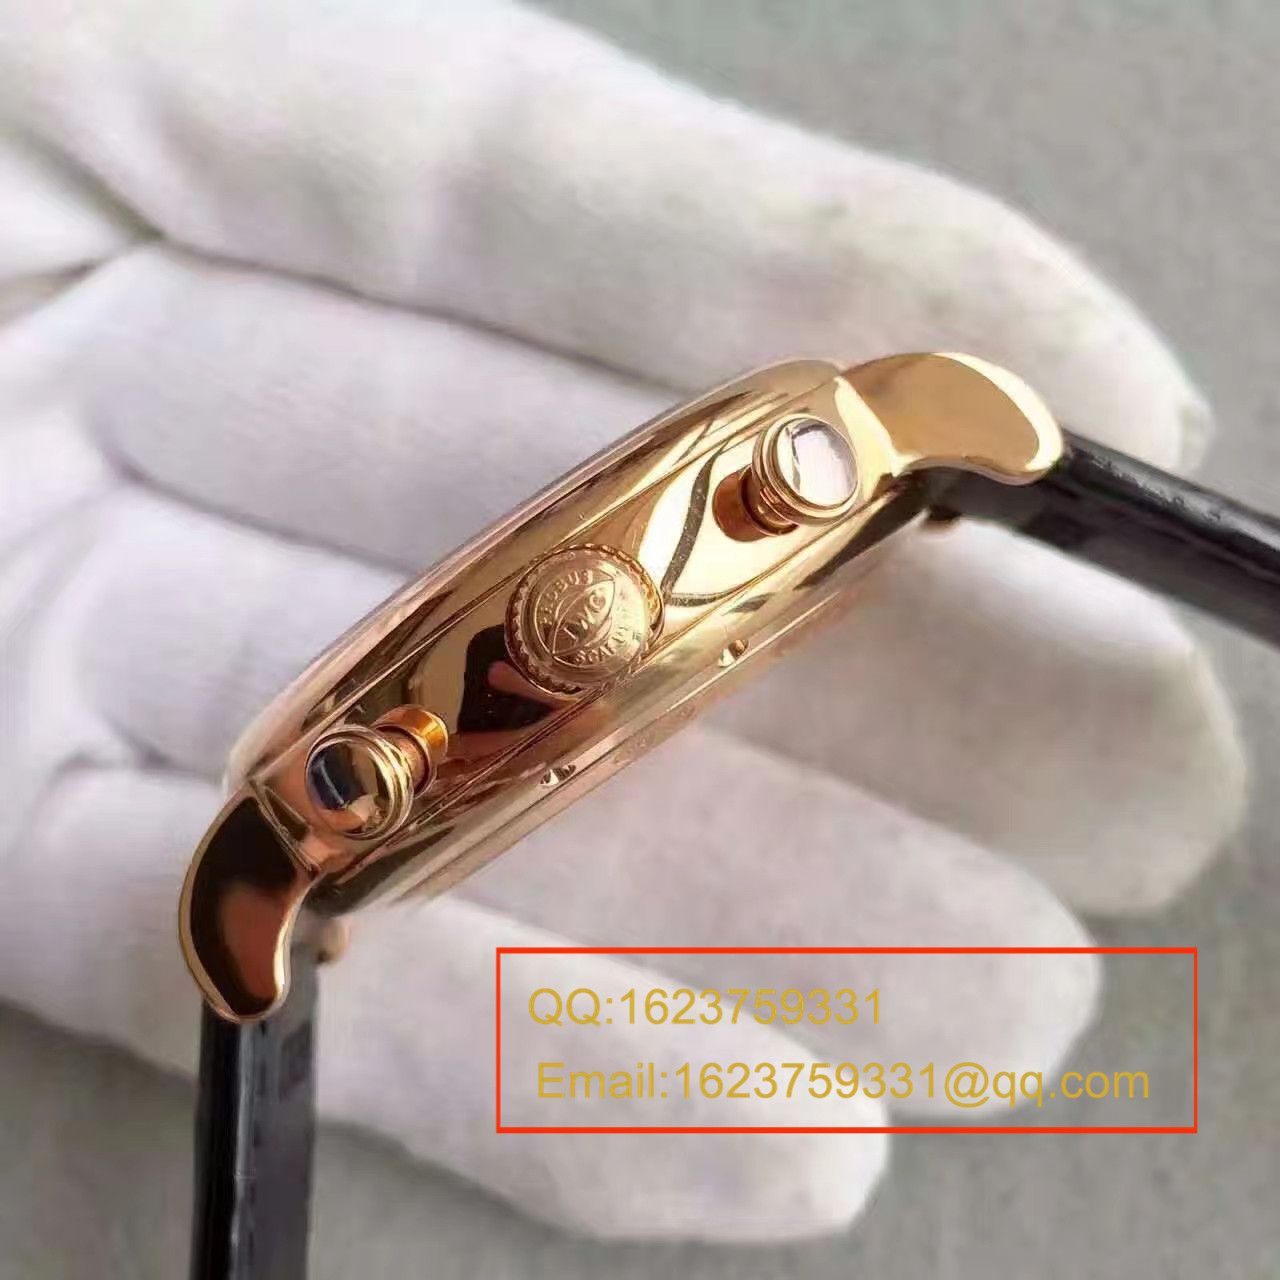 【MK厂一比一精仿手表】万国柏涛菲诺系列IW391021 多功能机械计时腕表 / WG134